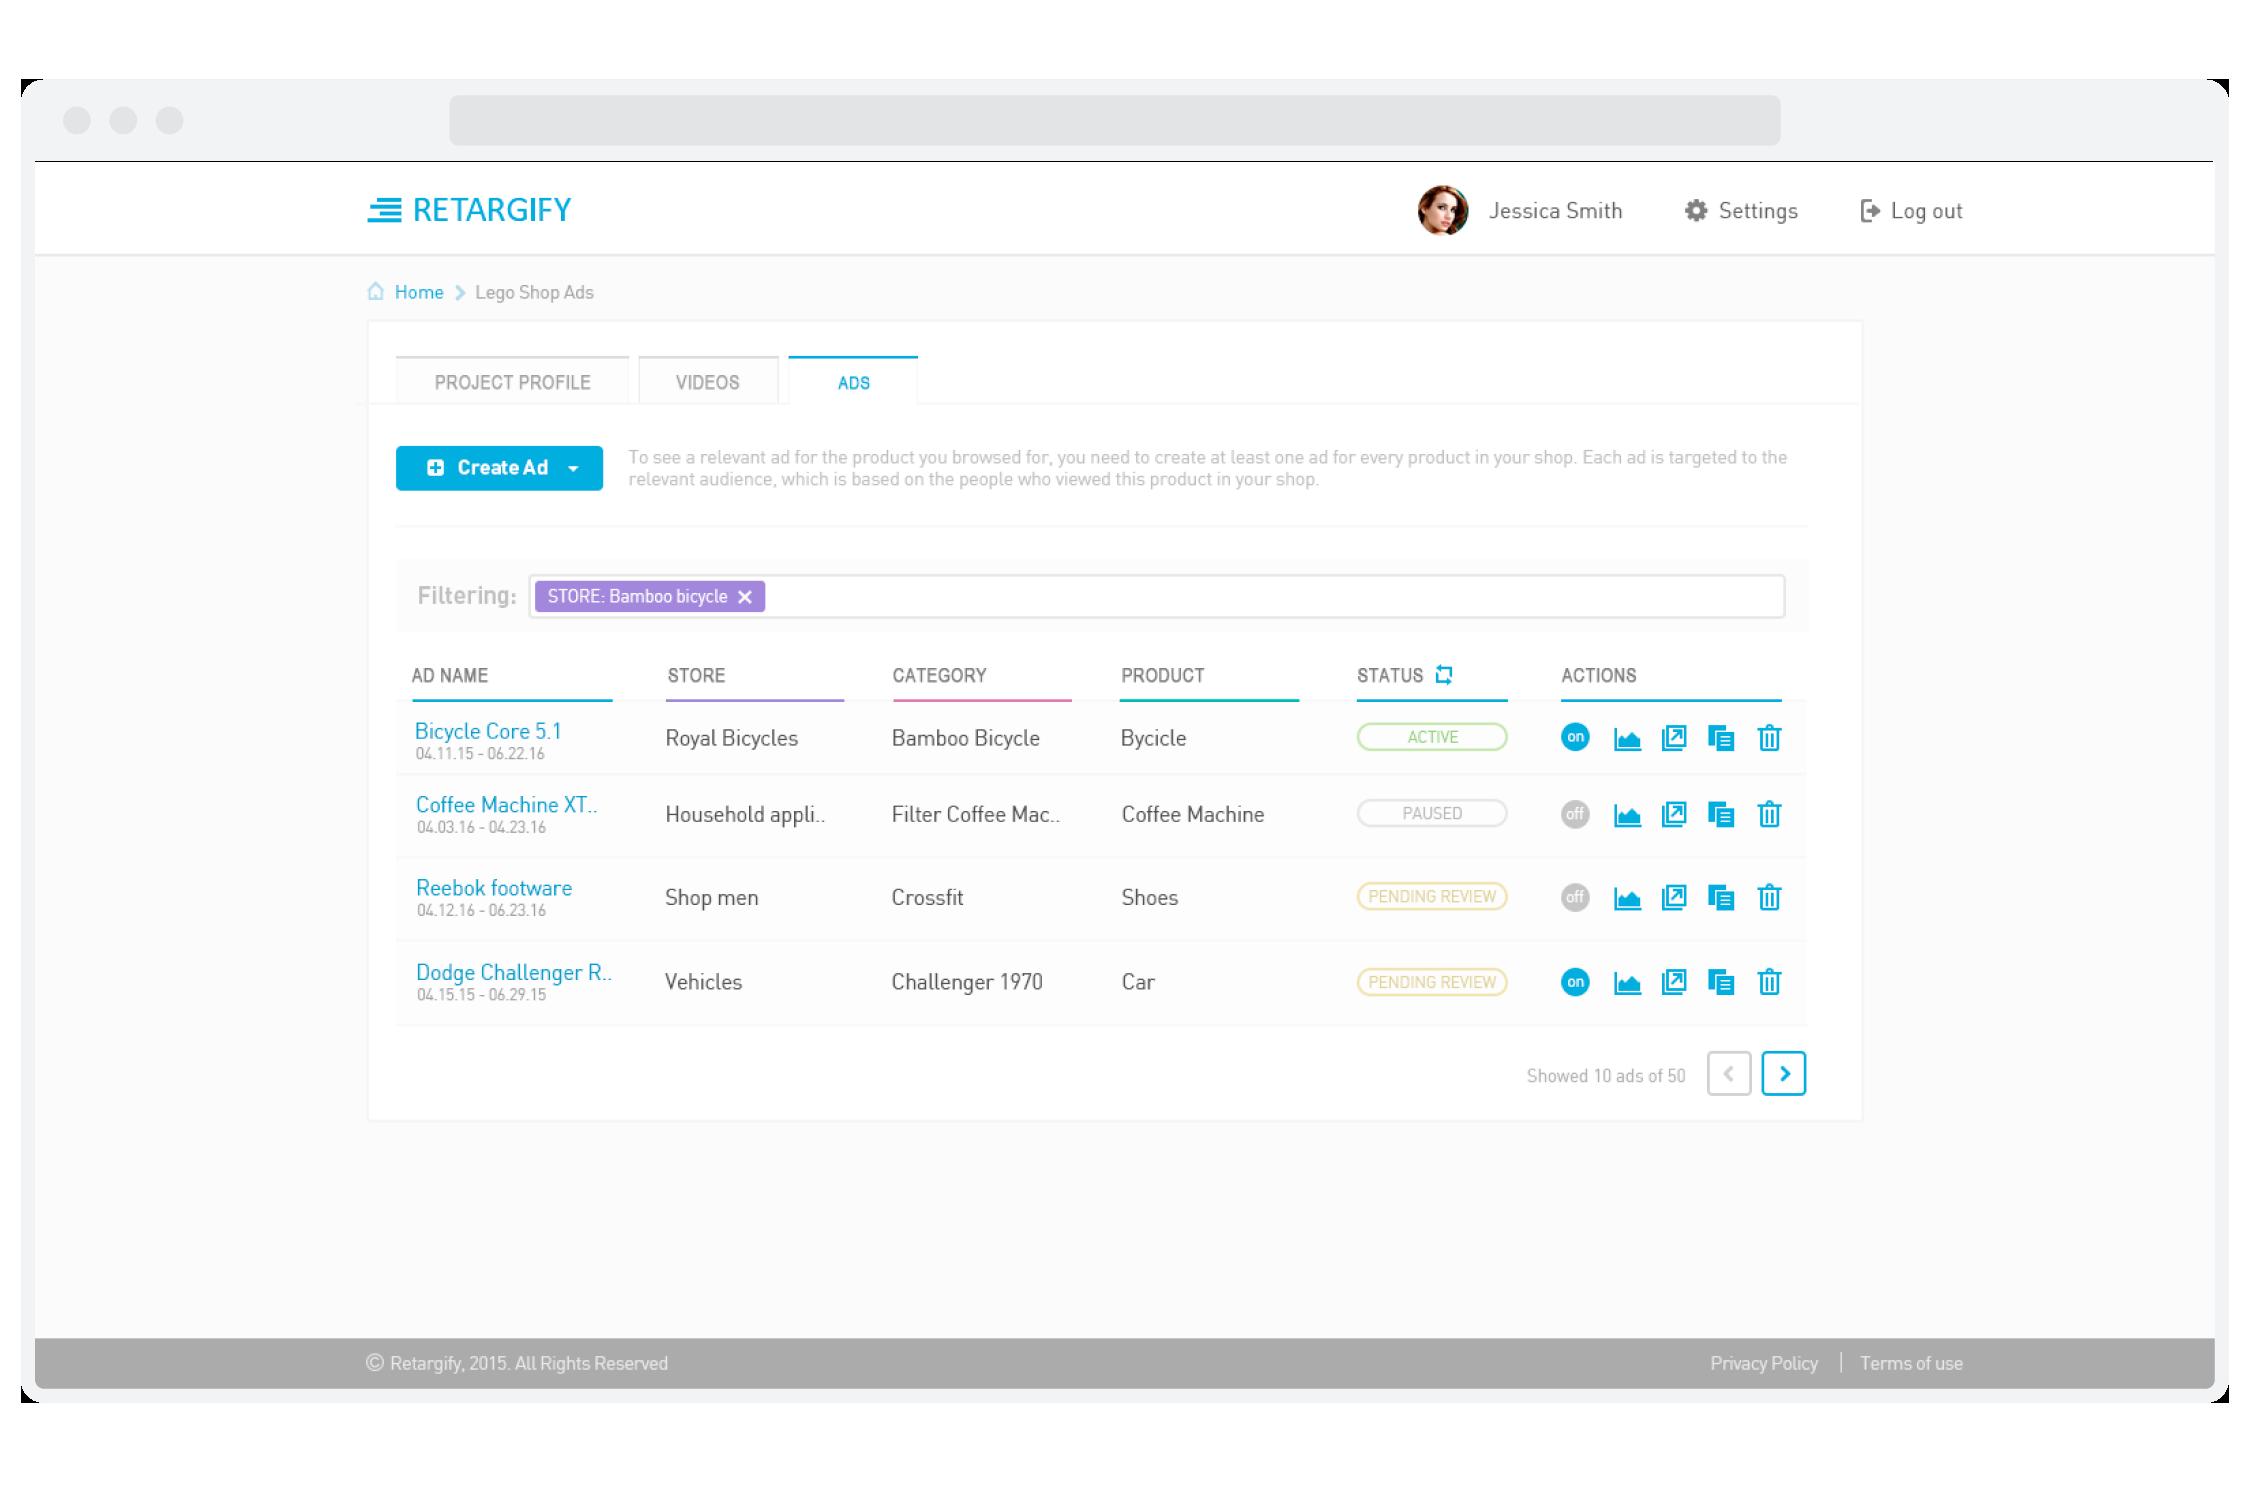 Retargify Marketing Automation Platform Dashboard